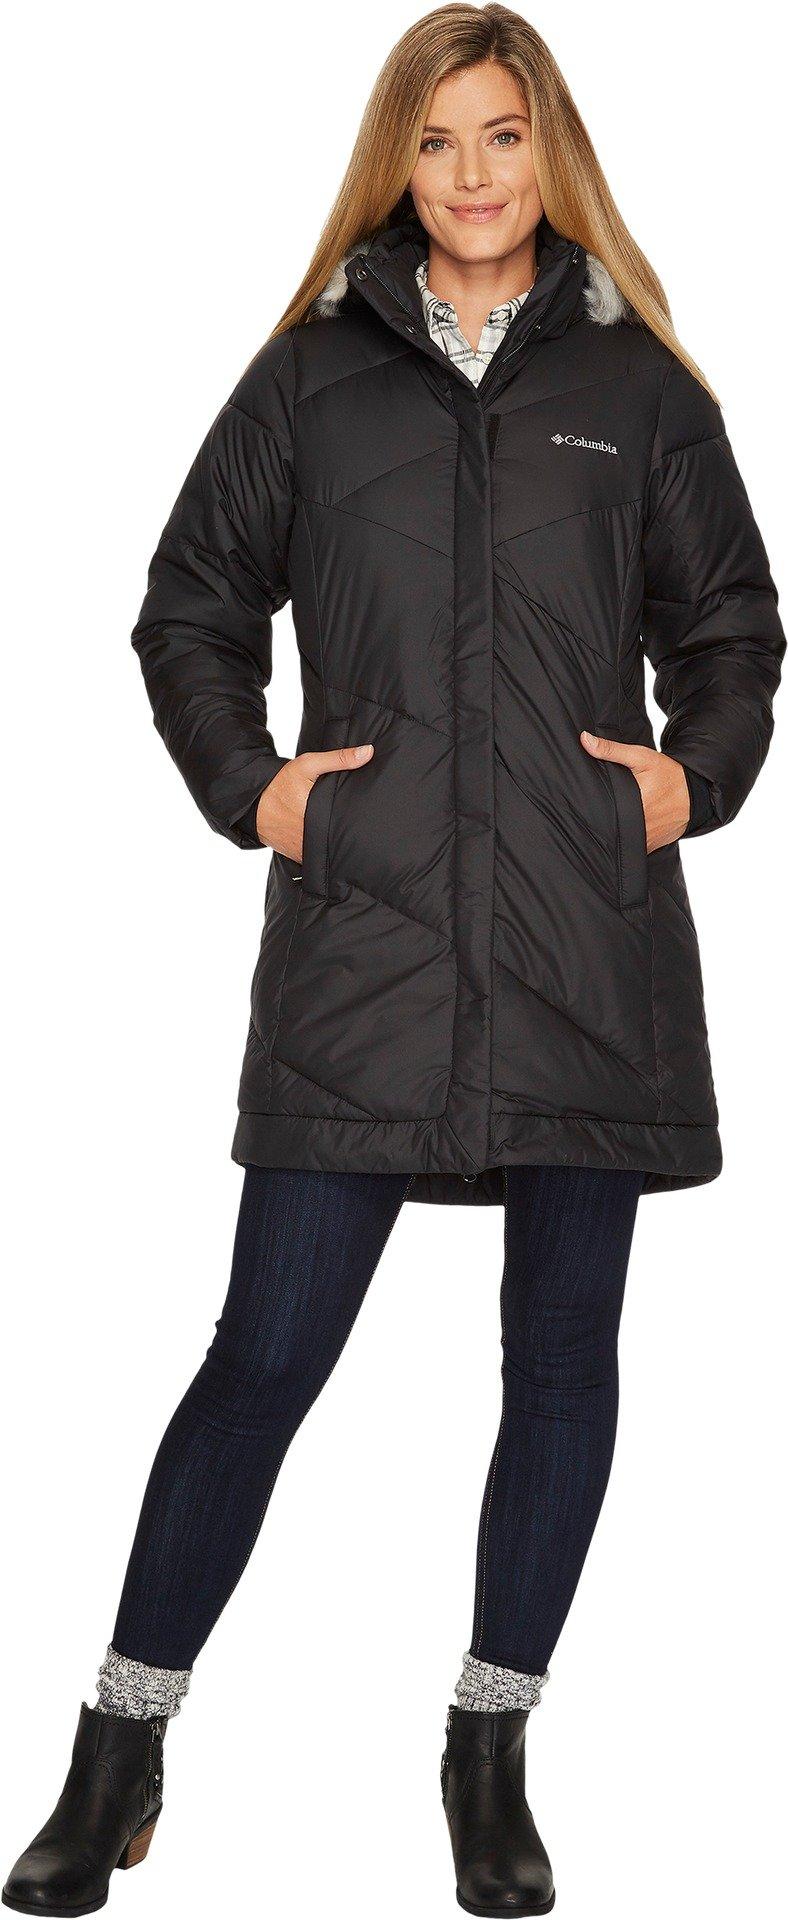 Columbia Women's Snow Eclipse Mid Jacket, Black, M